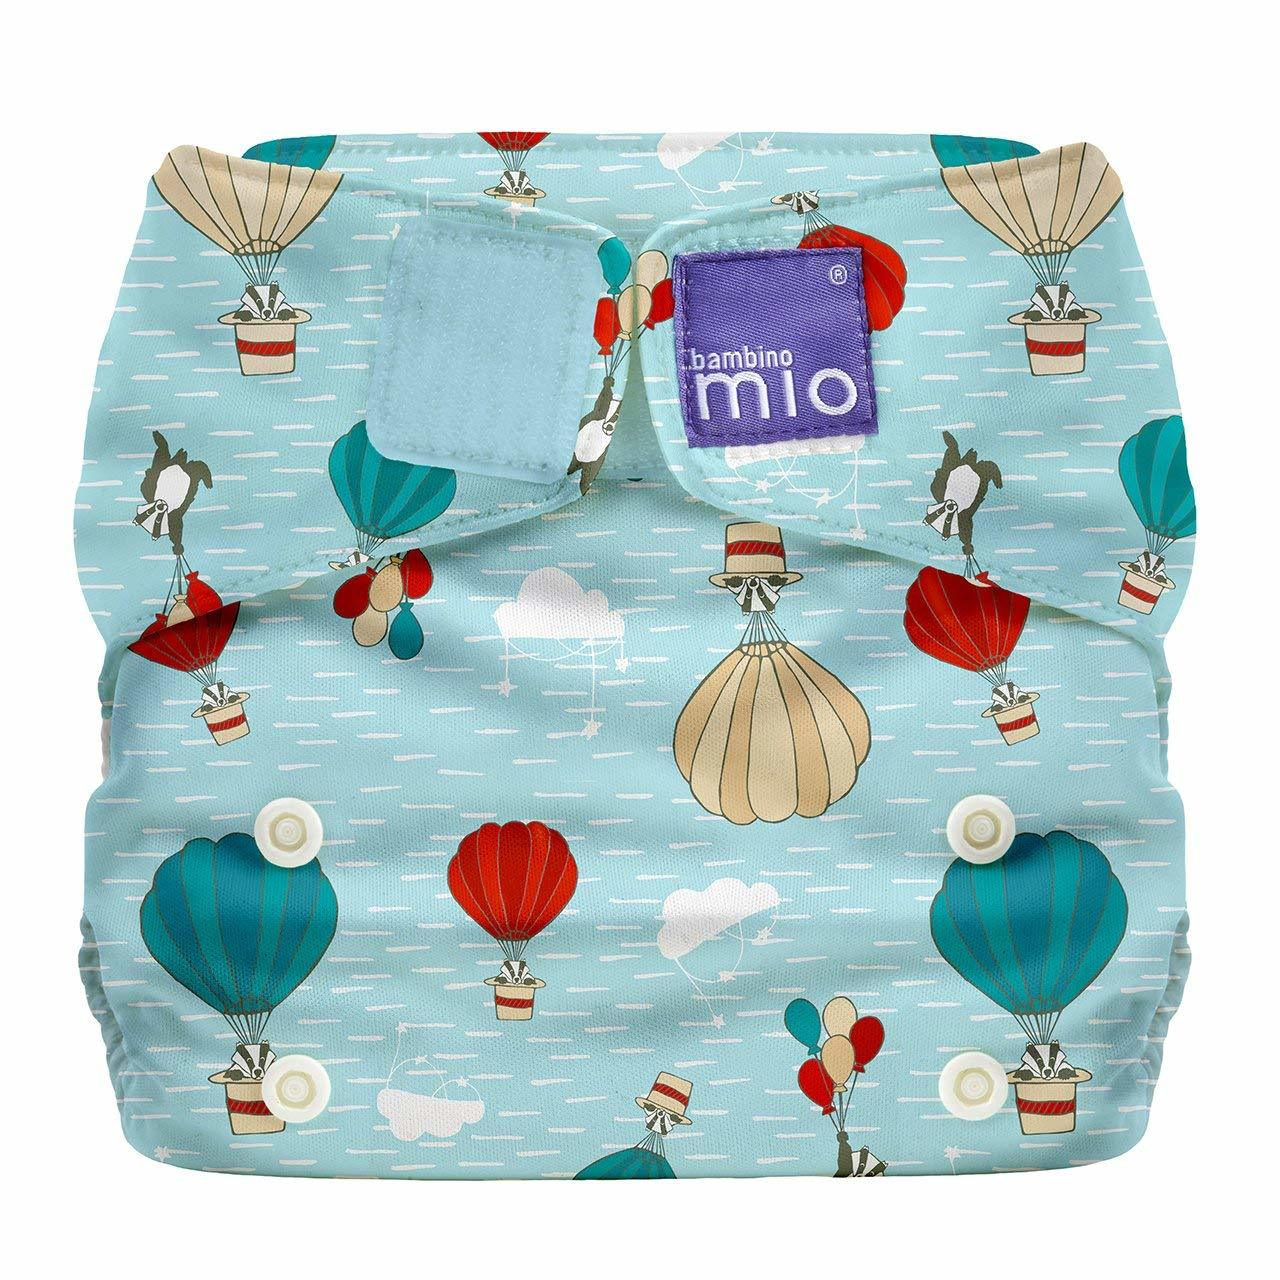 Bambino Mio: Miosolo All-in-One Nappy - Sky Ride image